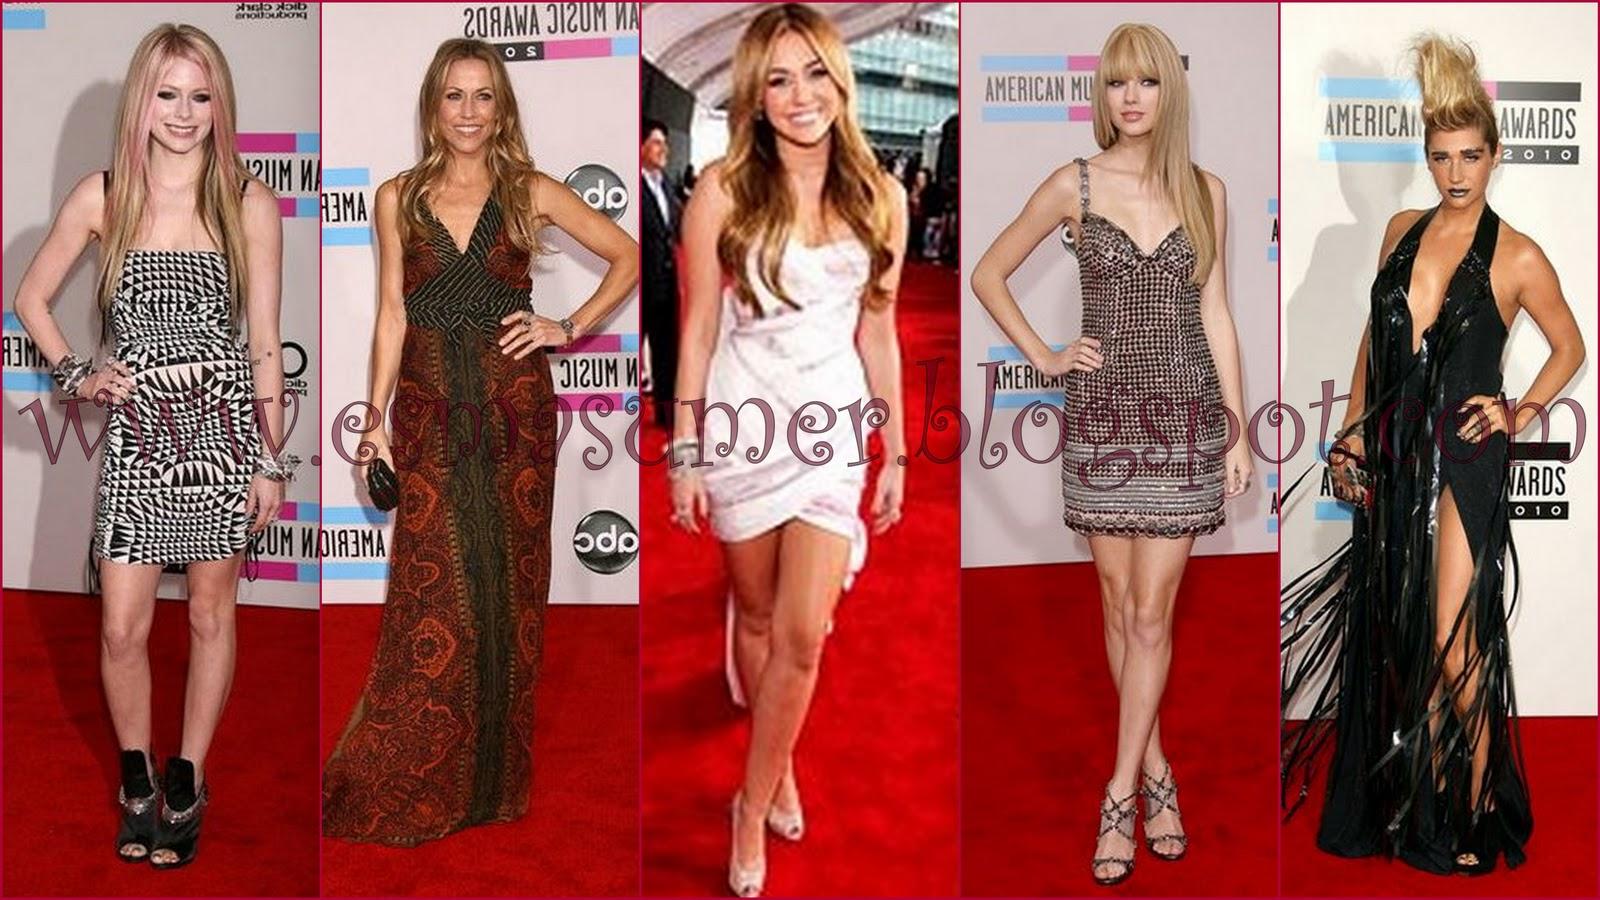 http://1.bp.blogspot.com/_fr7ueTUugVs/TOp5F_w8haI/AAAAAAAAEno/g1J8MUaP7nw/s1600/american+music+awards+2010.jpg